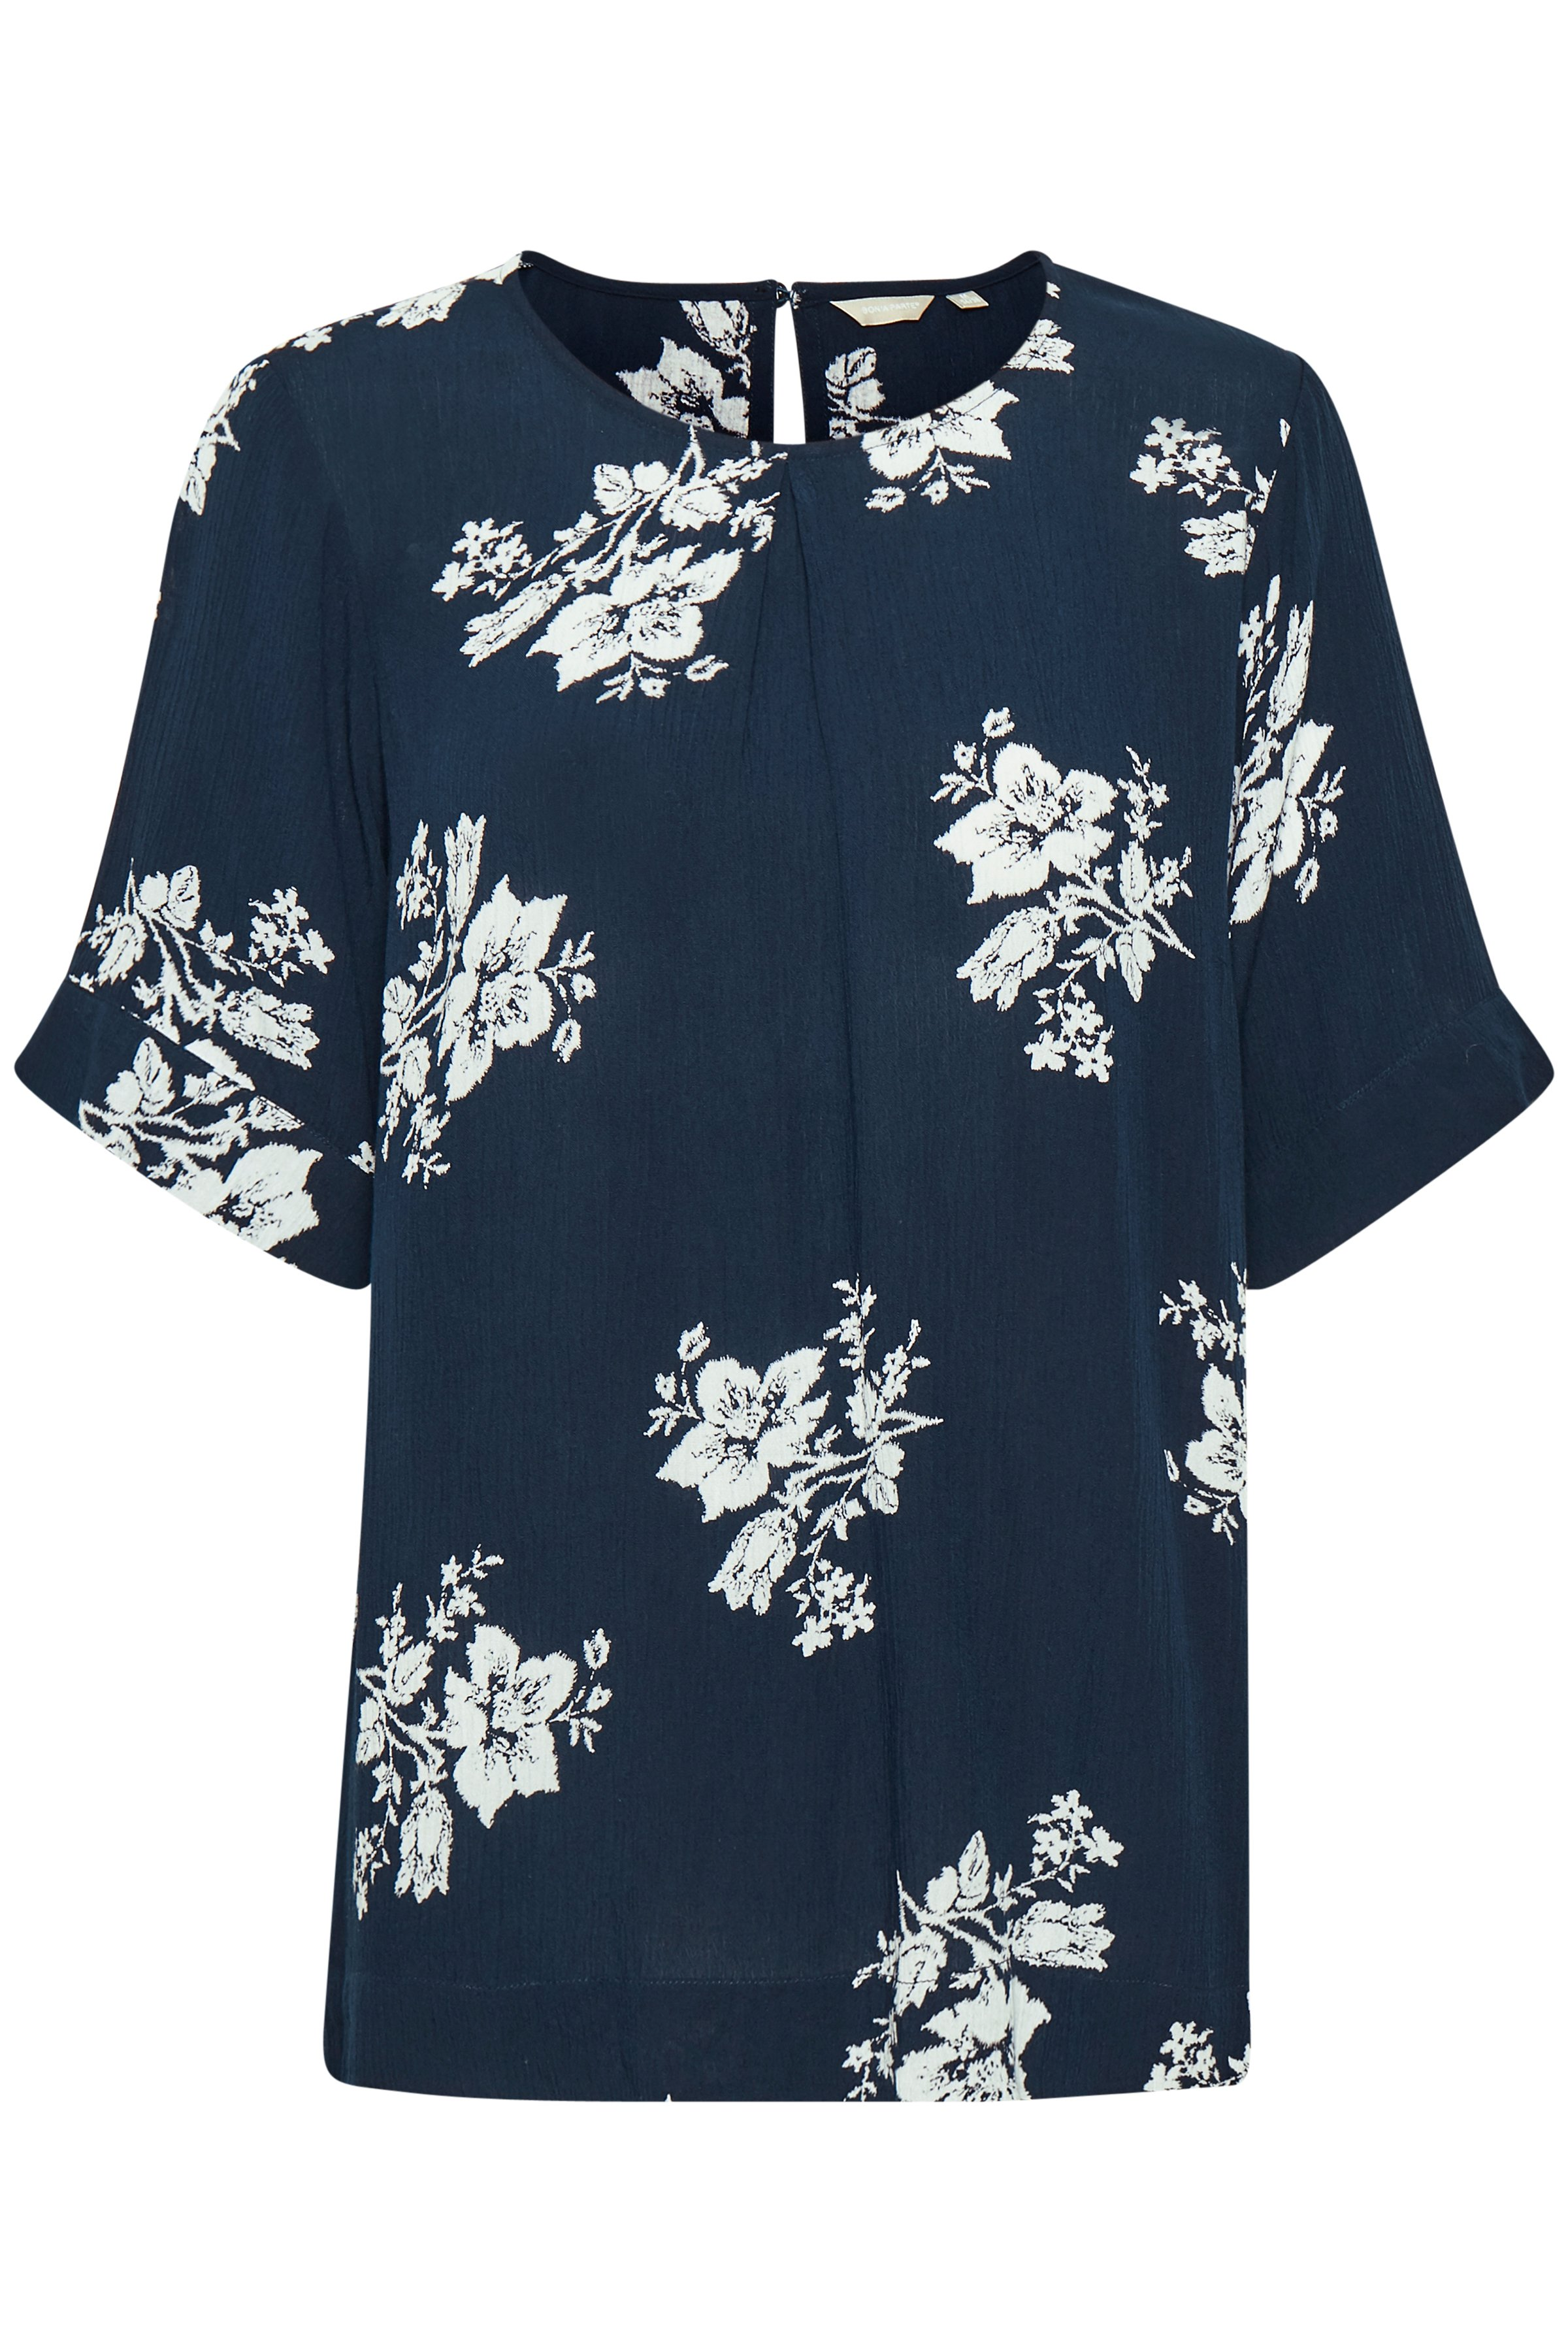 Marineblau/wollweiss Bluse von Bon'A Parte – Shoppen SieMarineblau/wollweiss Bluse ab Gr. S-2XL hier